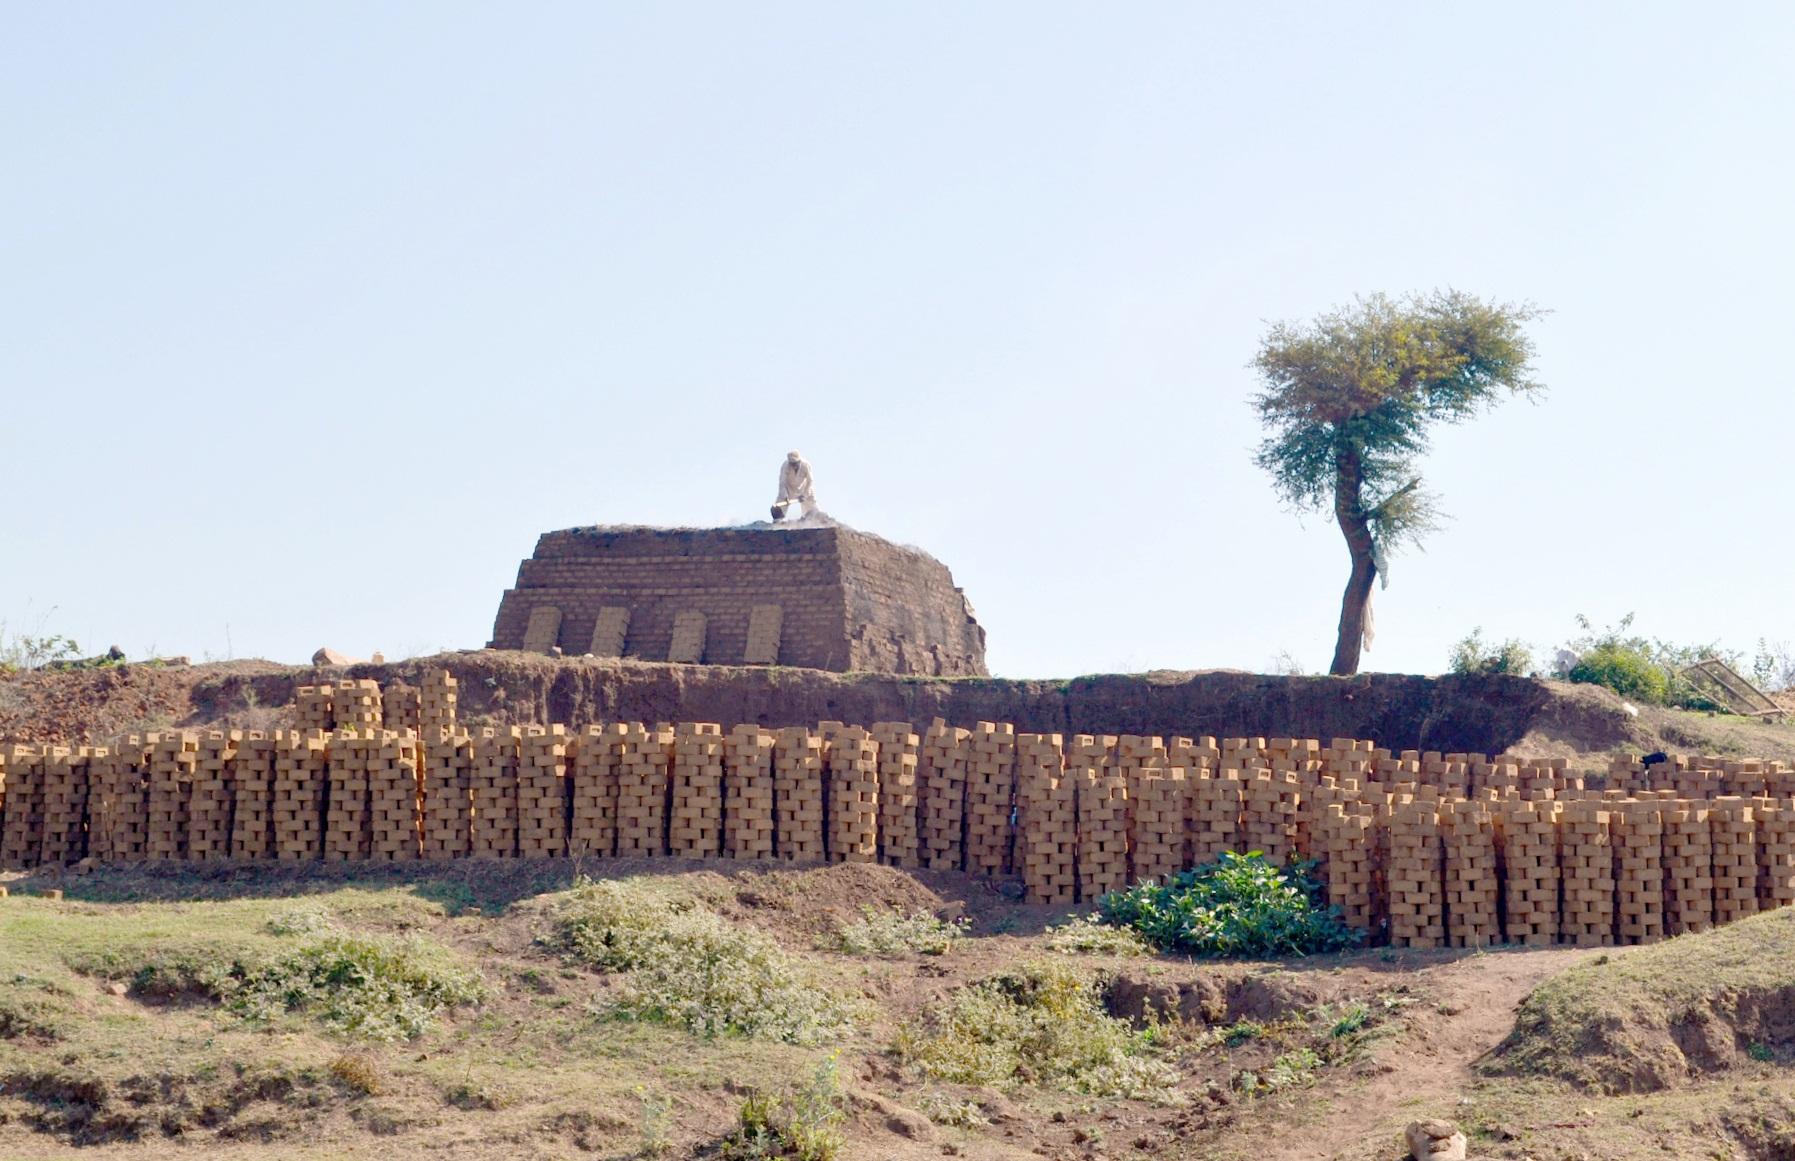 नदी किनारे अवैध रूप से मिट्टी की खुदाई कर बेरोकटोक बनाई जा रही ईंट